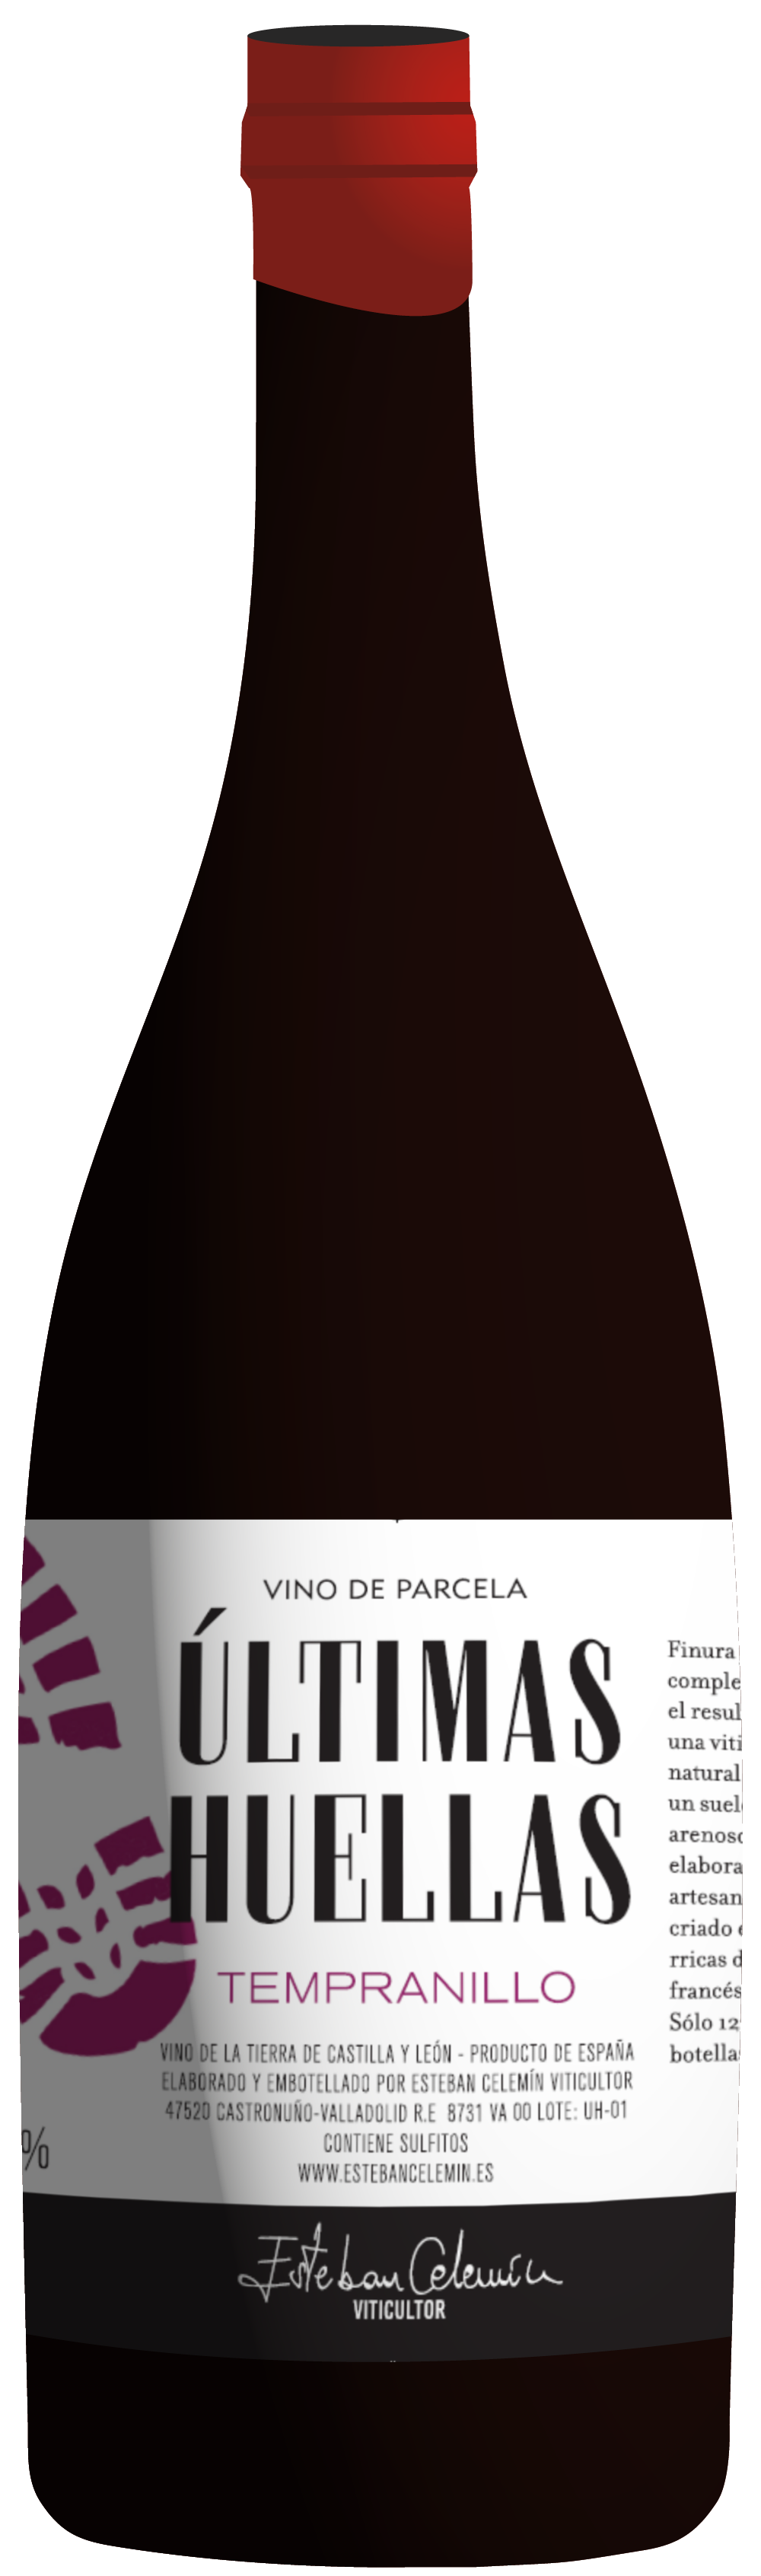 the natural wine company club august 2020 spain esteban celemin ultimas huellas